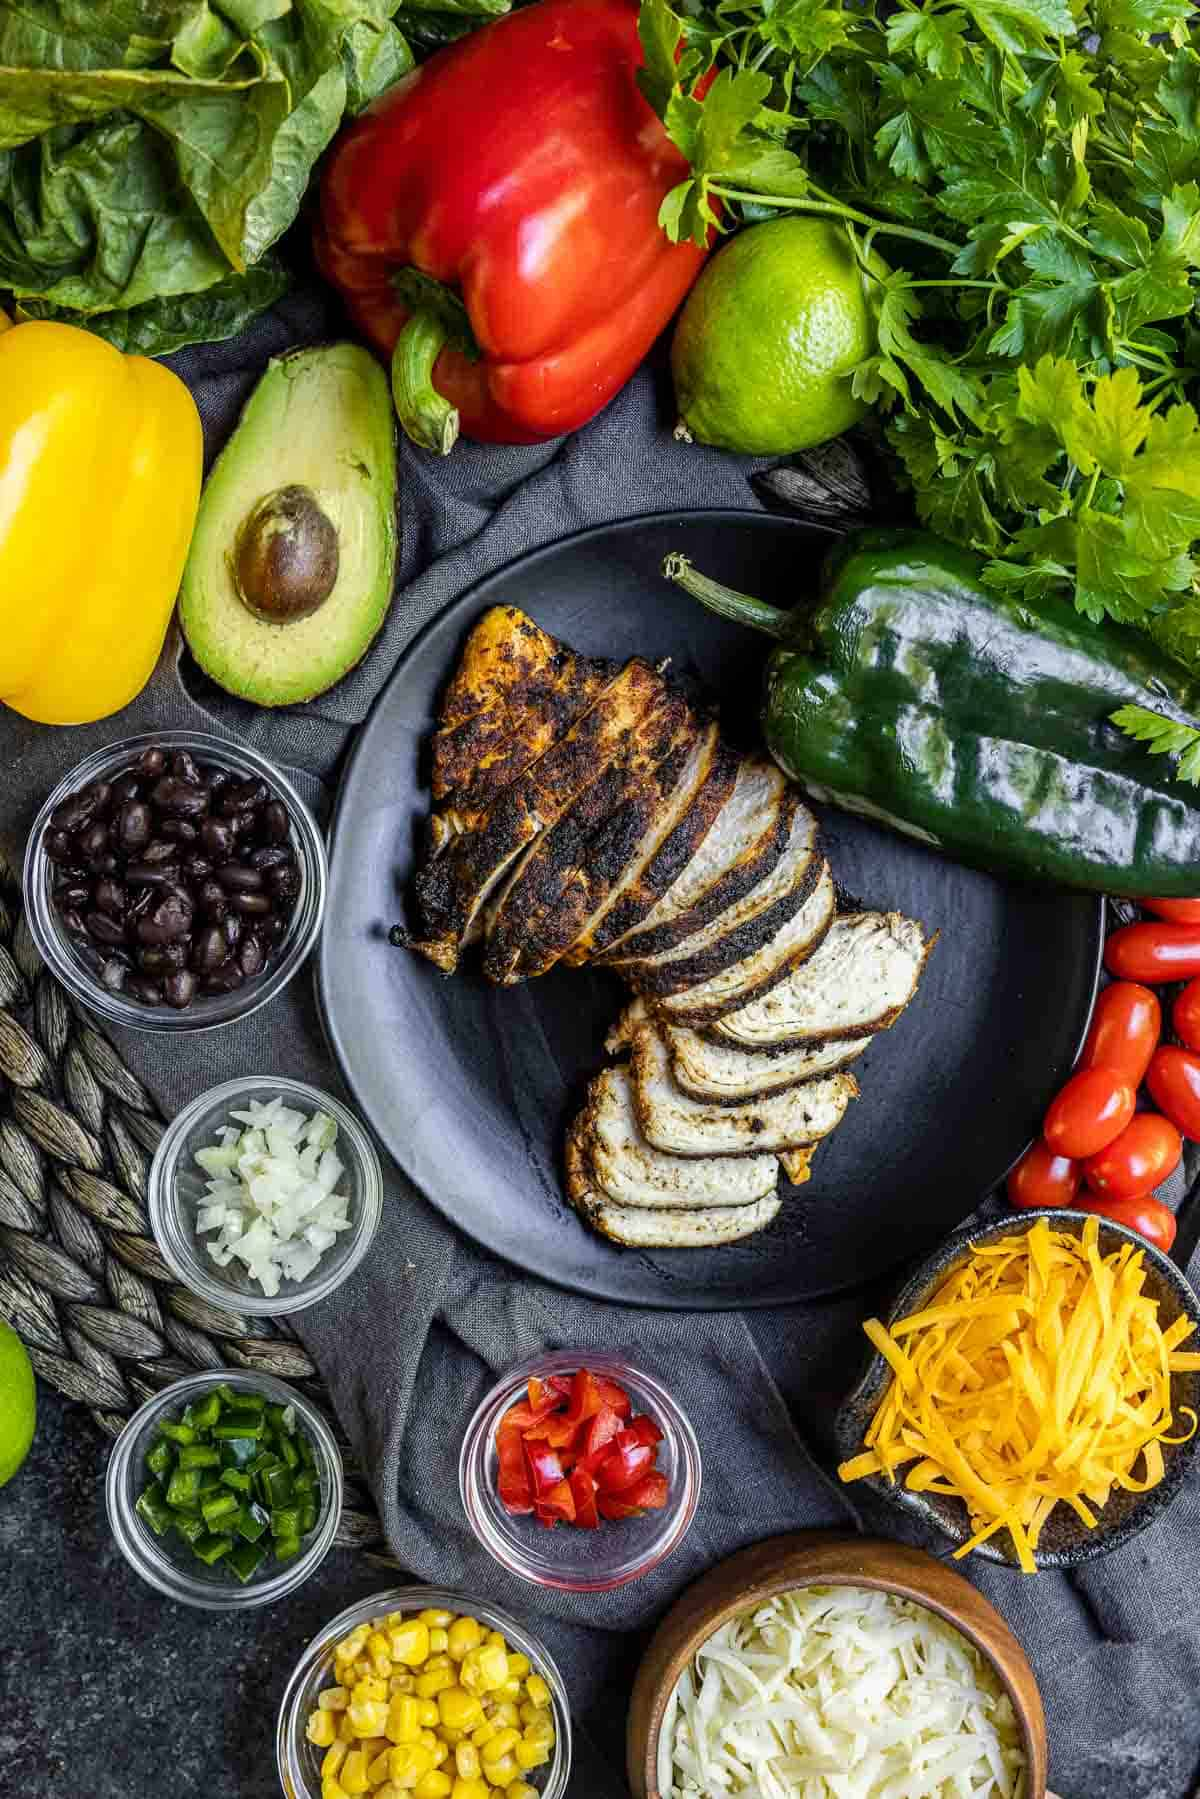 ingredients for a Southwest Salad